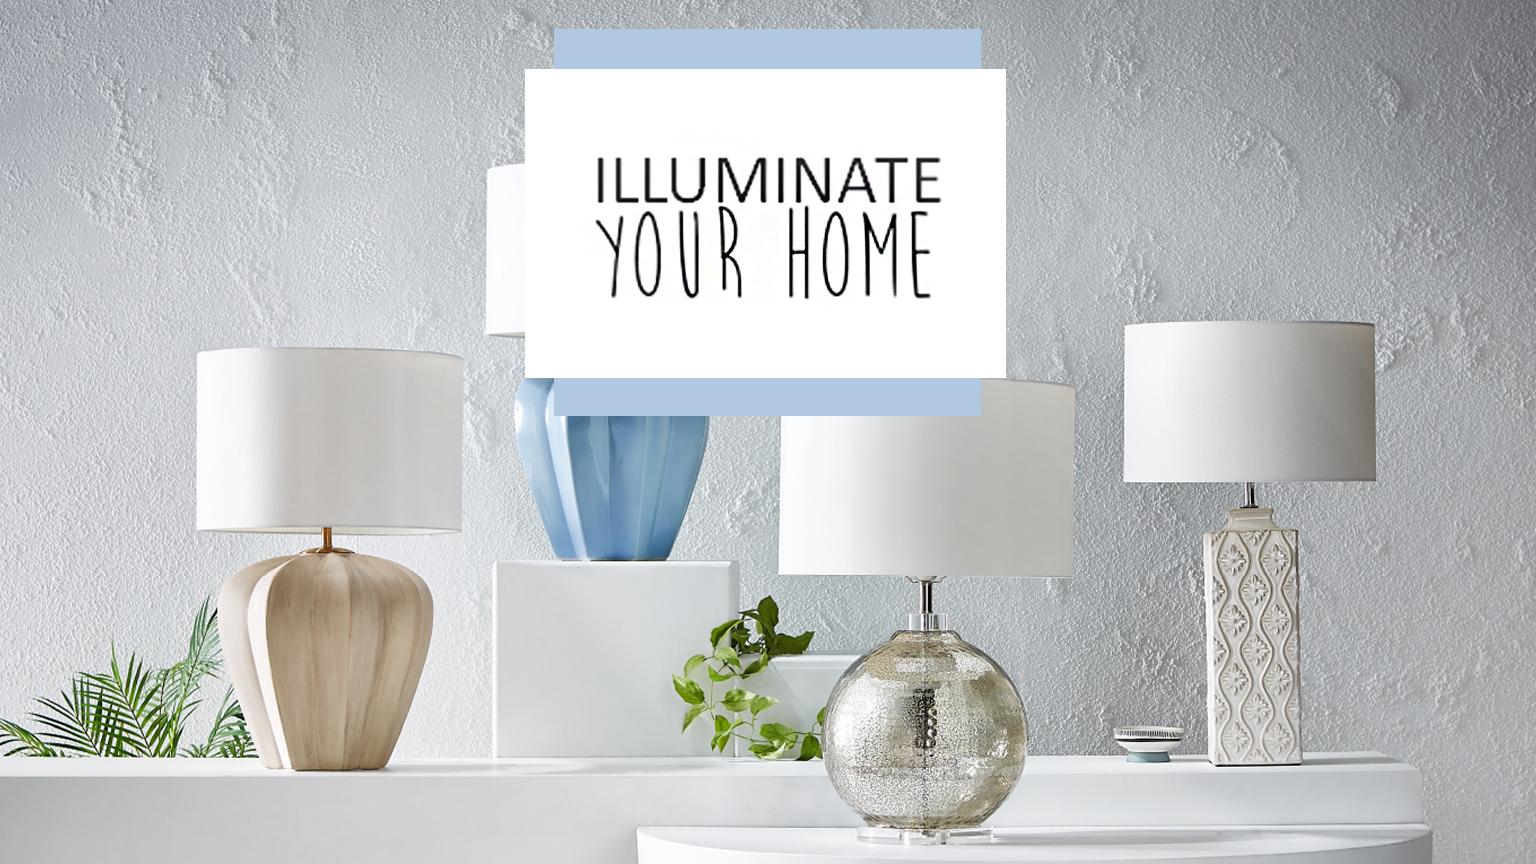 Lighting - Illuminate your home